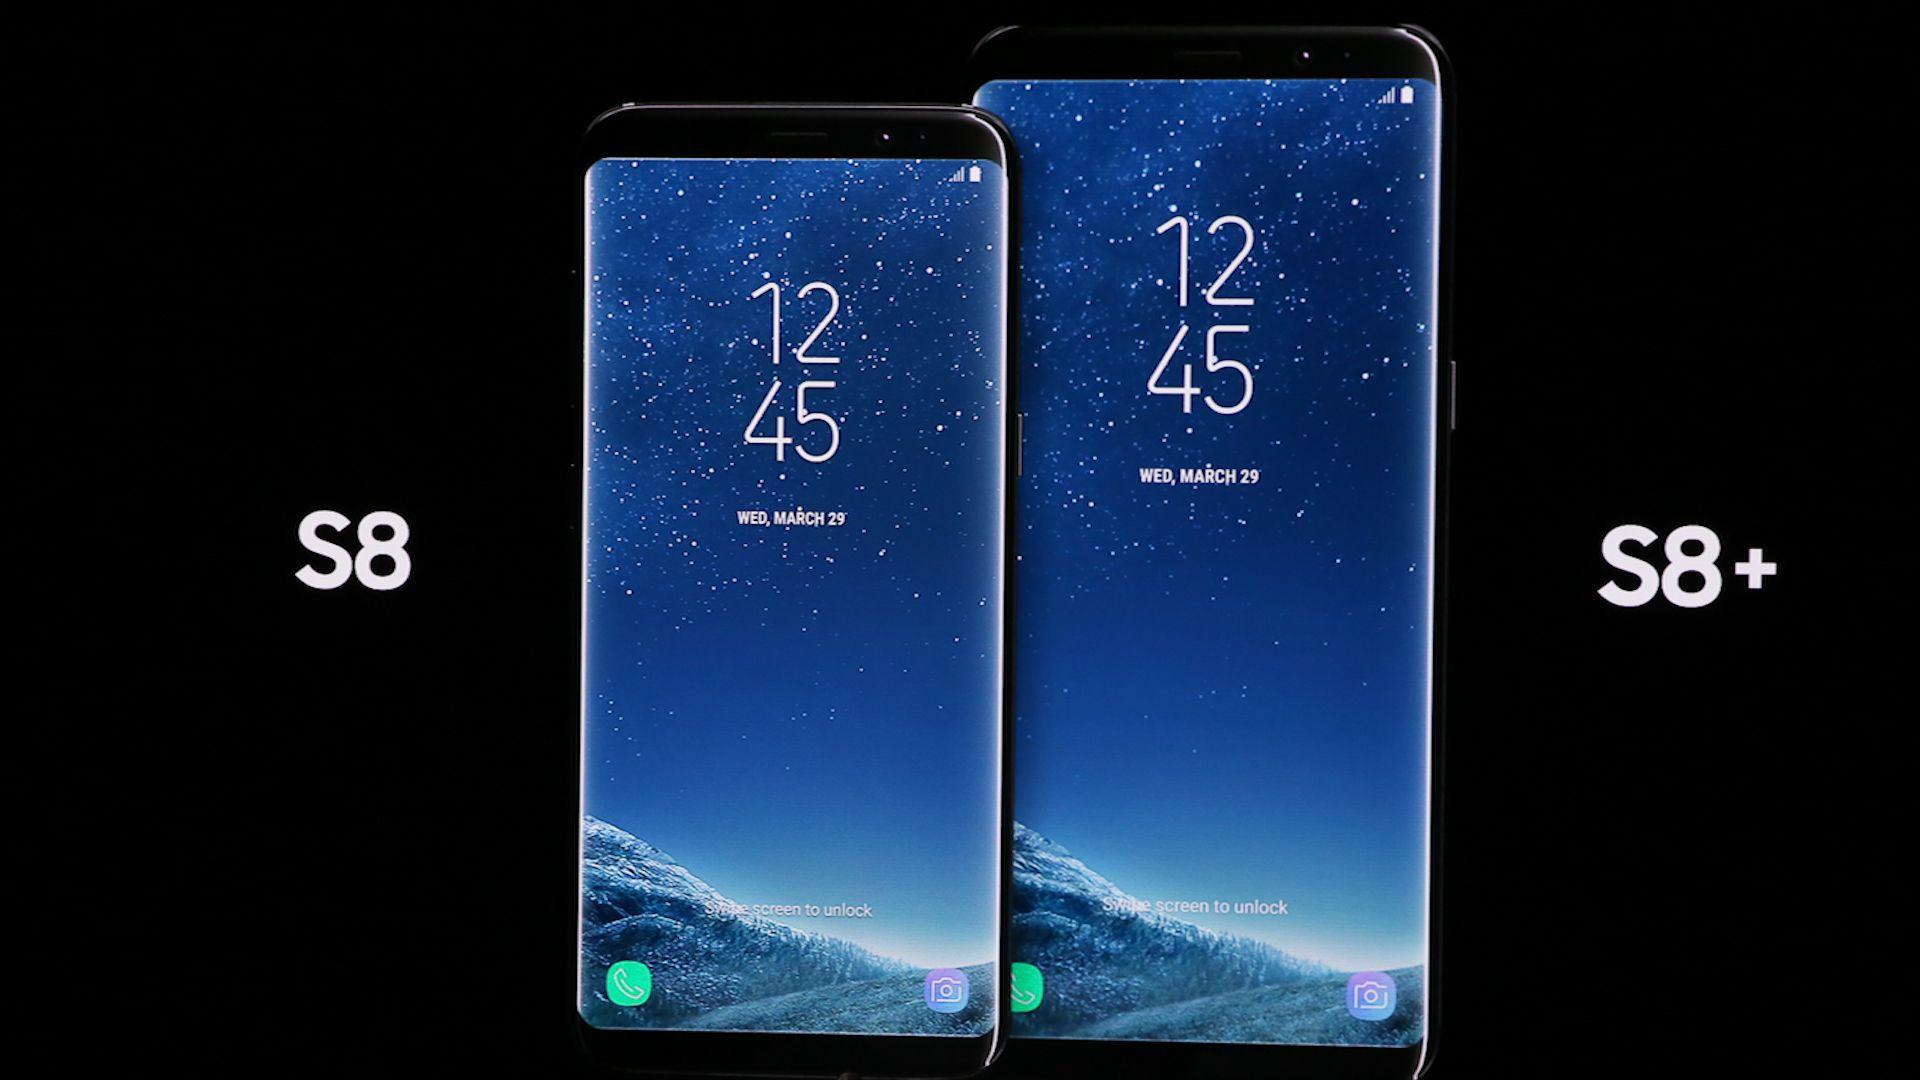 5_phones_instead_iphone_x_samsung_galaxy_s8_galaxy_s8_lauren_blog_1.jpg